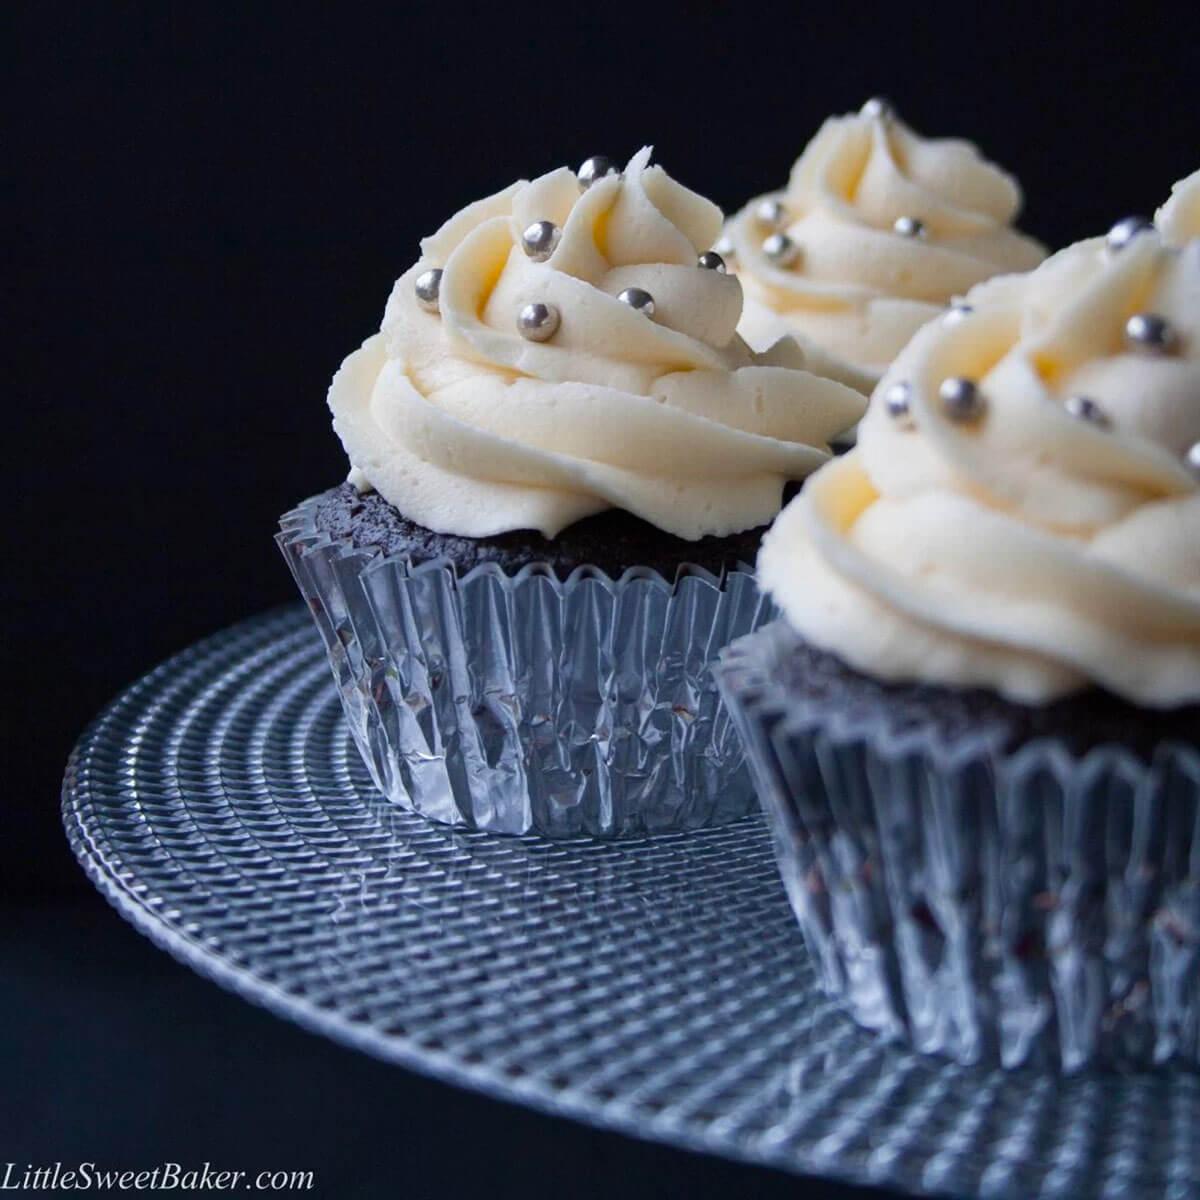 Dark Chocolate Cupcake Recipe with White Chocolate Buttercream Frosting